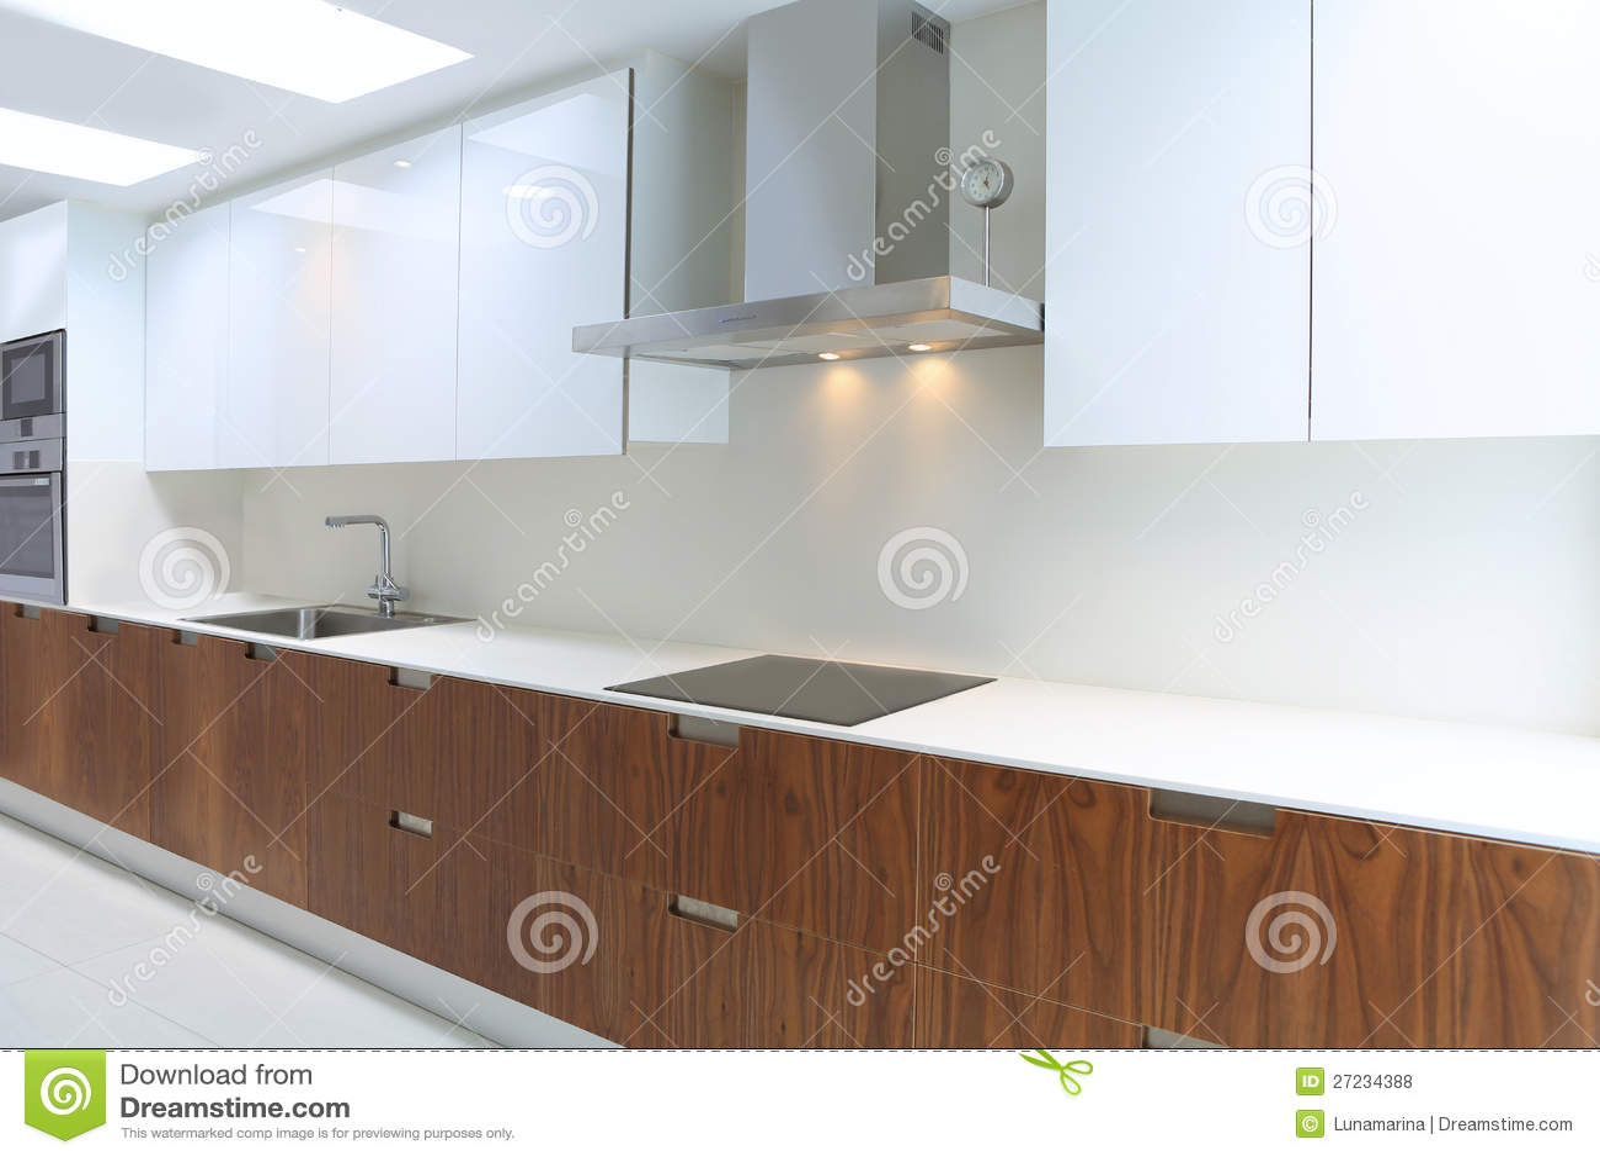 Daadwerkelijke moderne keuken in wit en okkernoothout - Moderne keukenbank ...